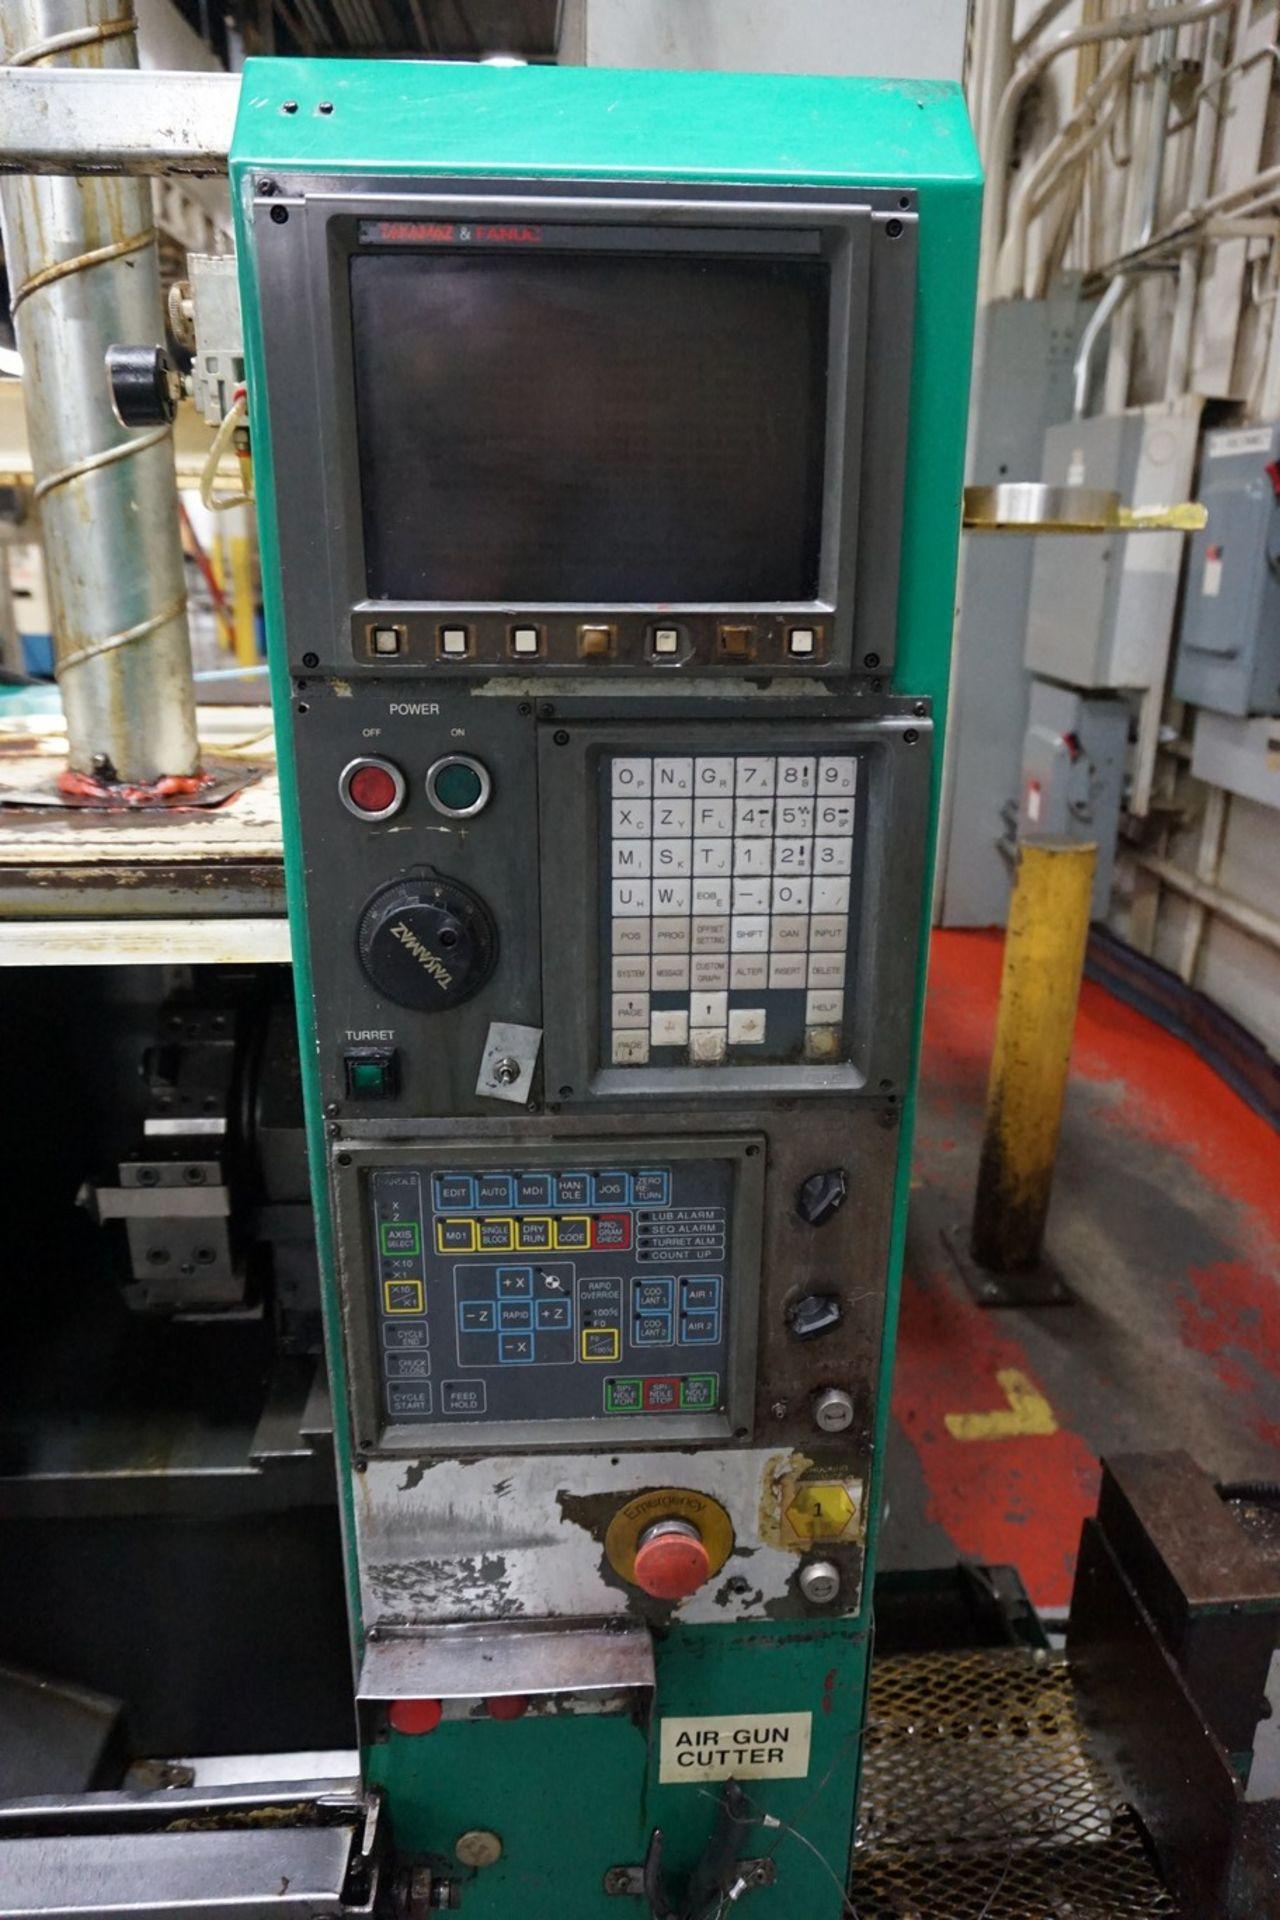 Takamatsu Model X10 CNC Lathe 200/220V c/w Chip Conveyor, Transformer - Image 2 of 6